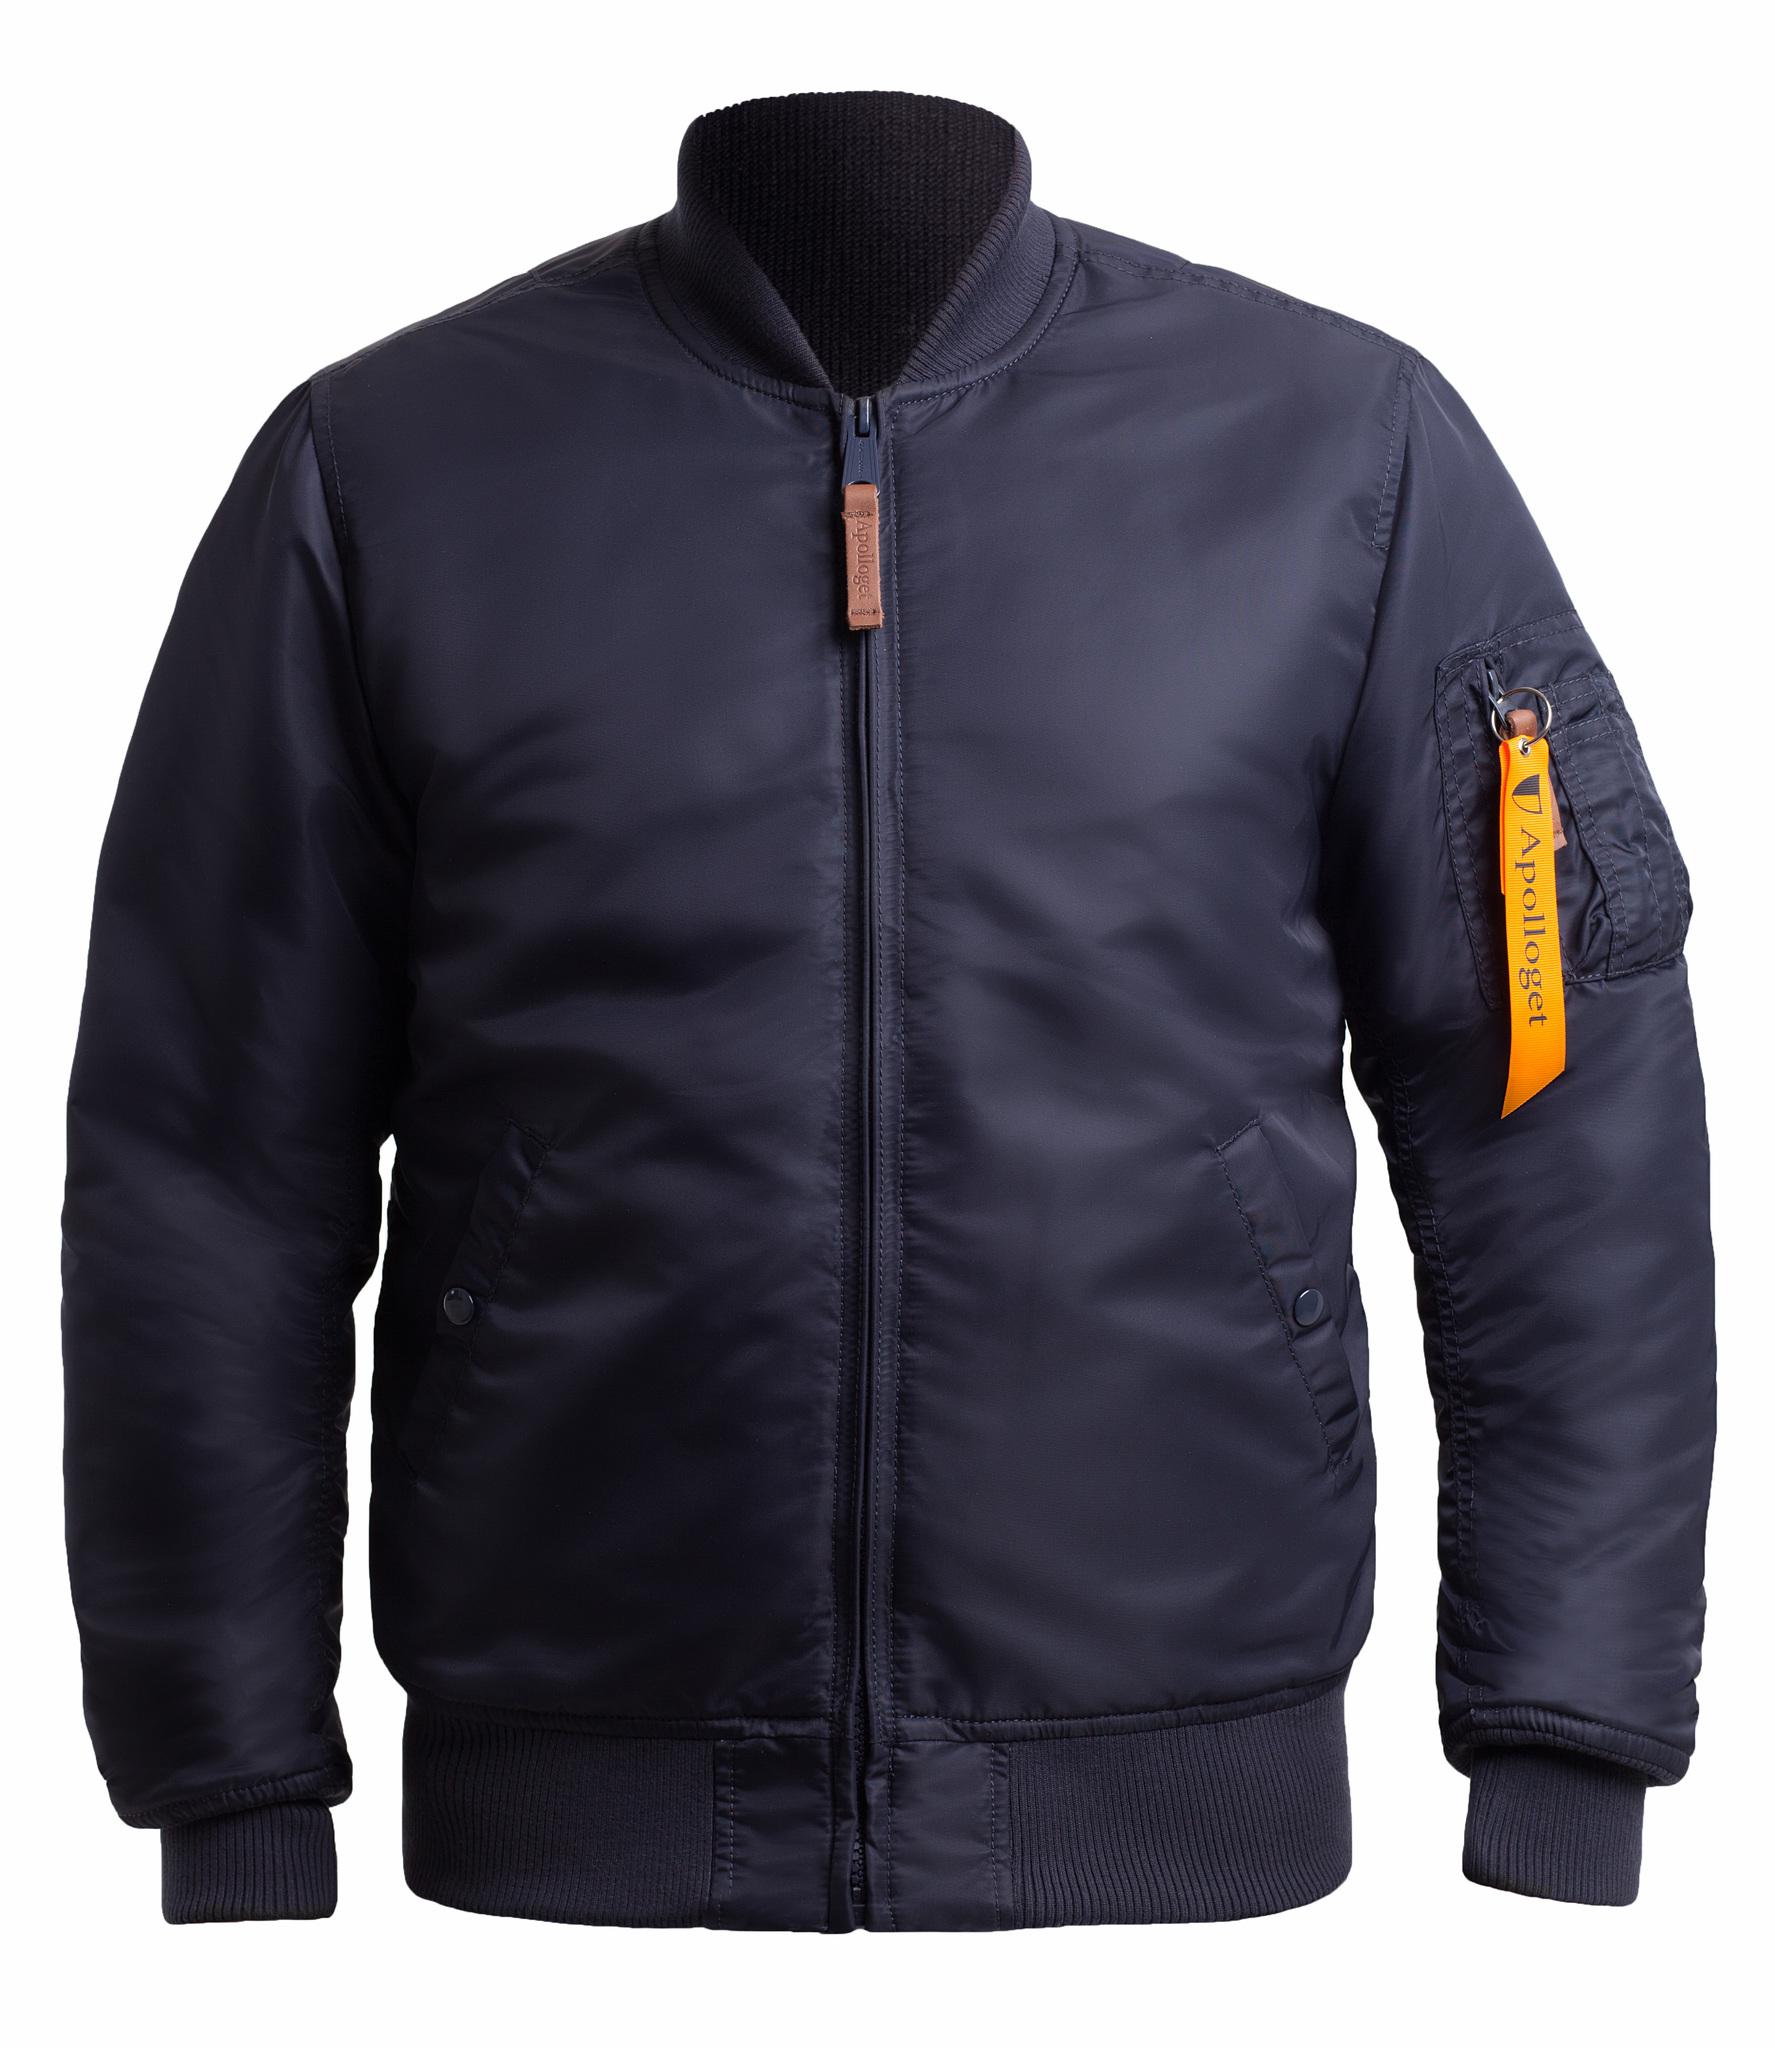 Куртка Бомбер - B-17 Apolloget (т.синяя - ink/orange)